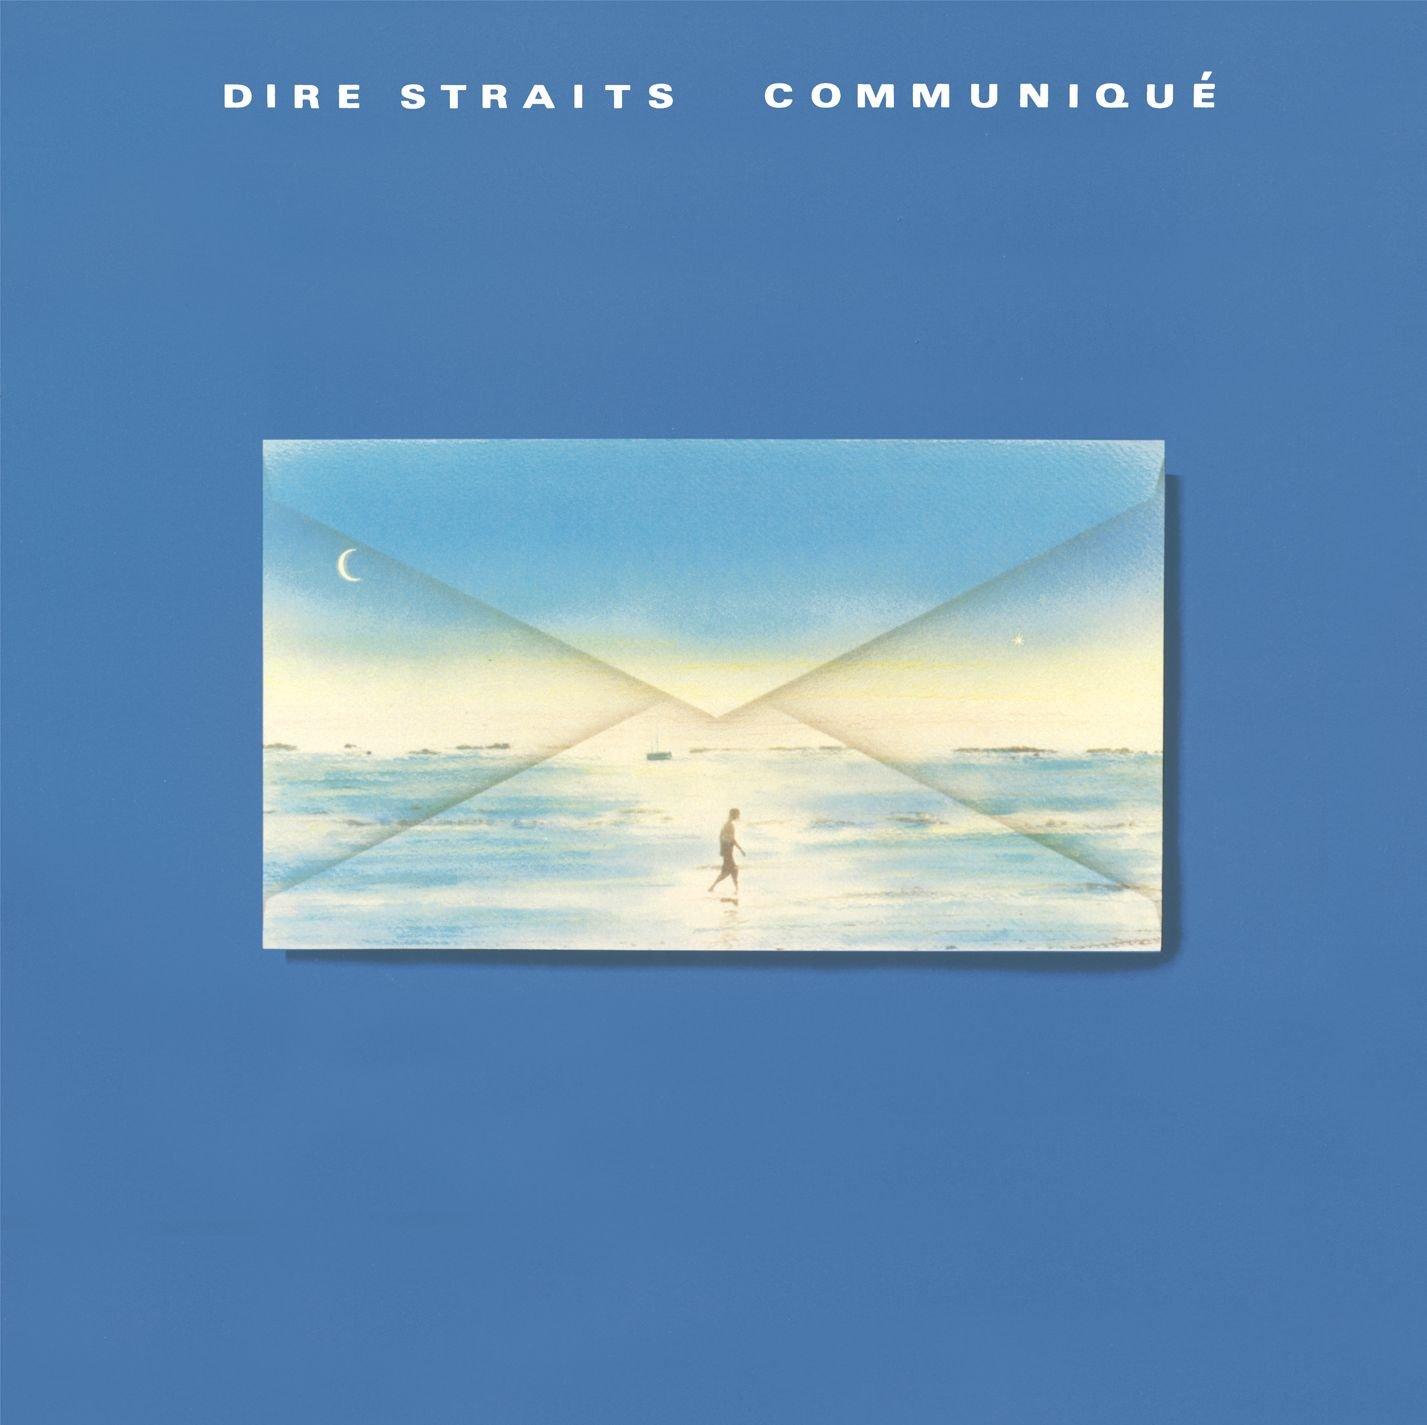 Dire Straits – Communiqu (2014) [FLAC]